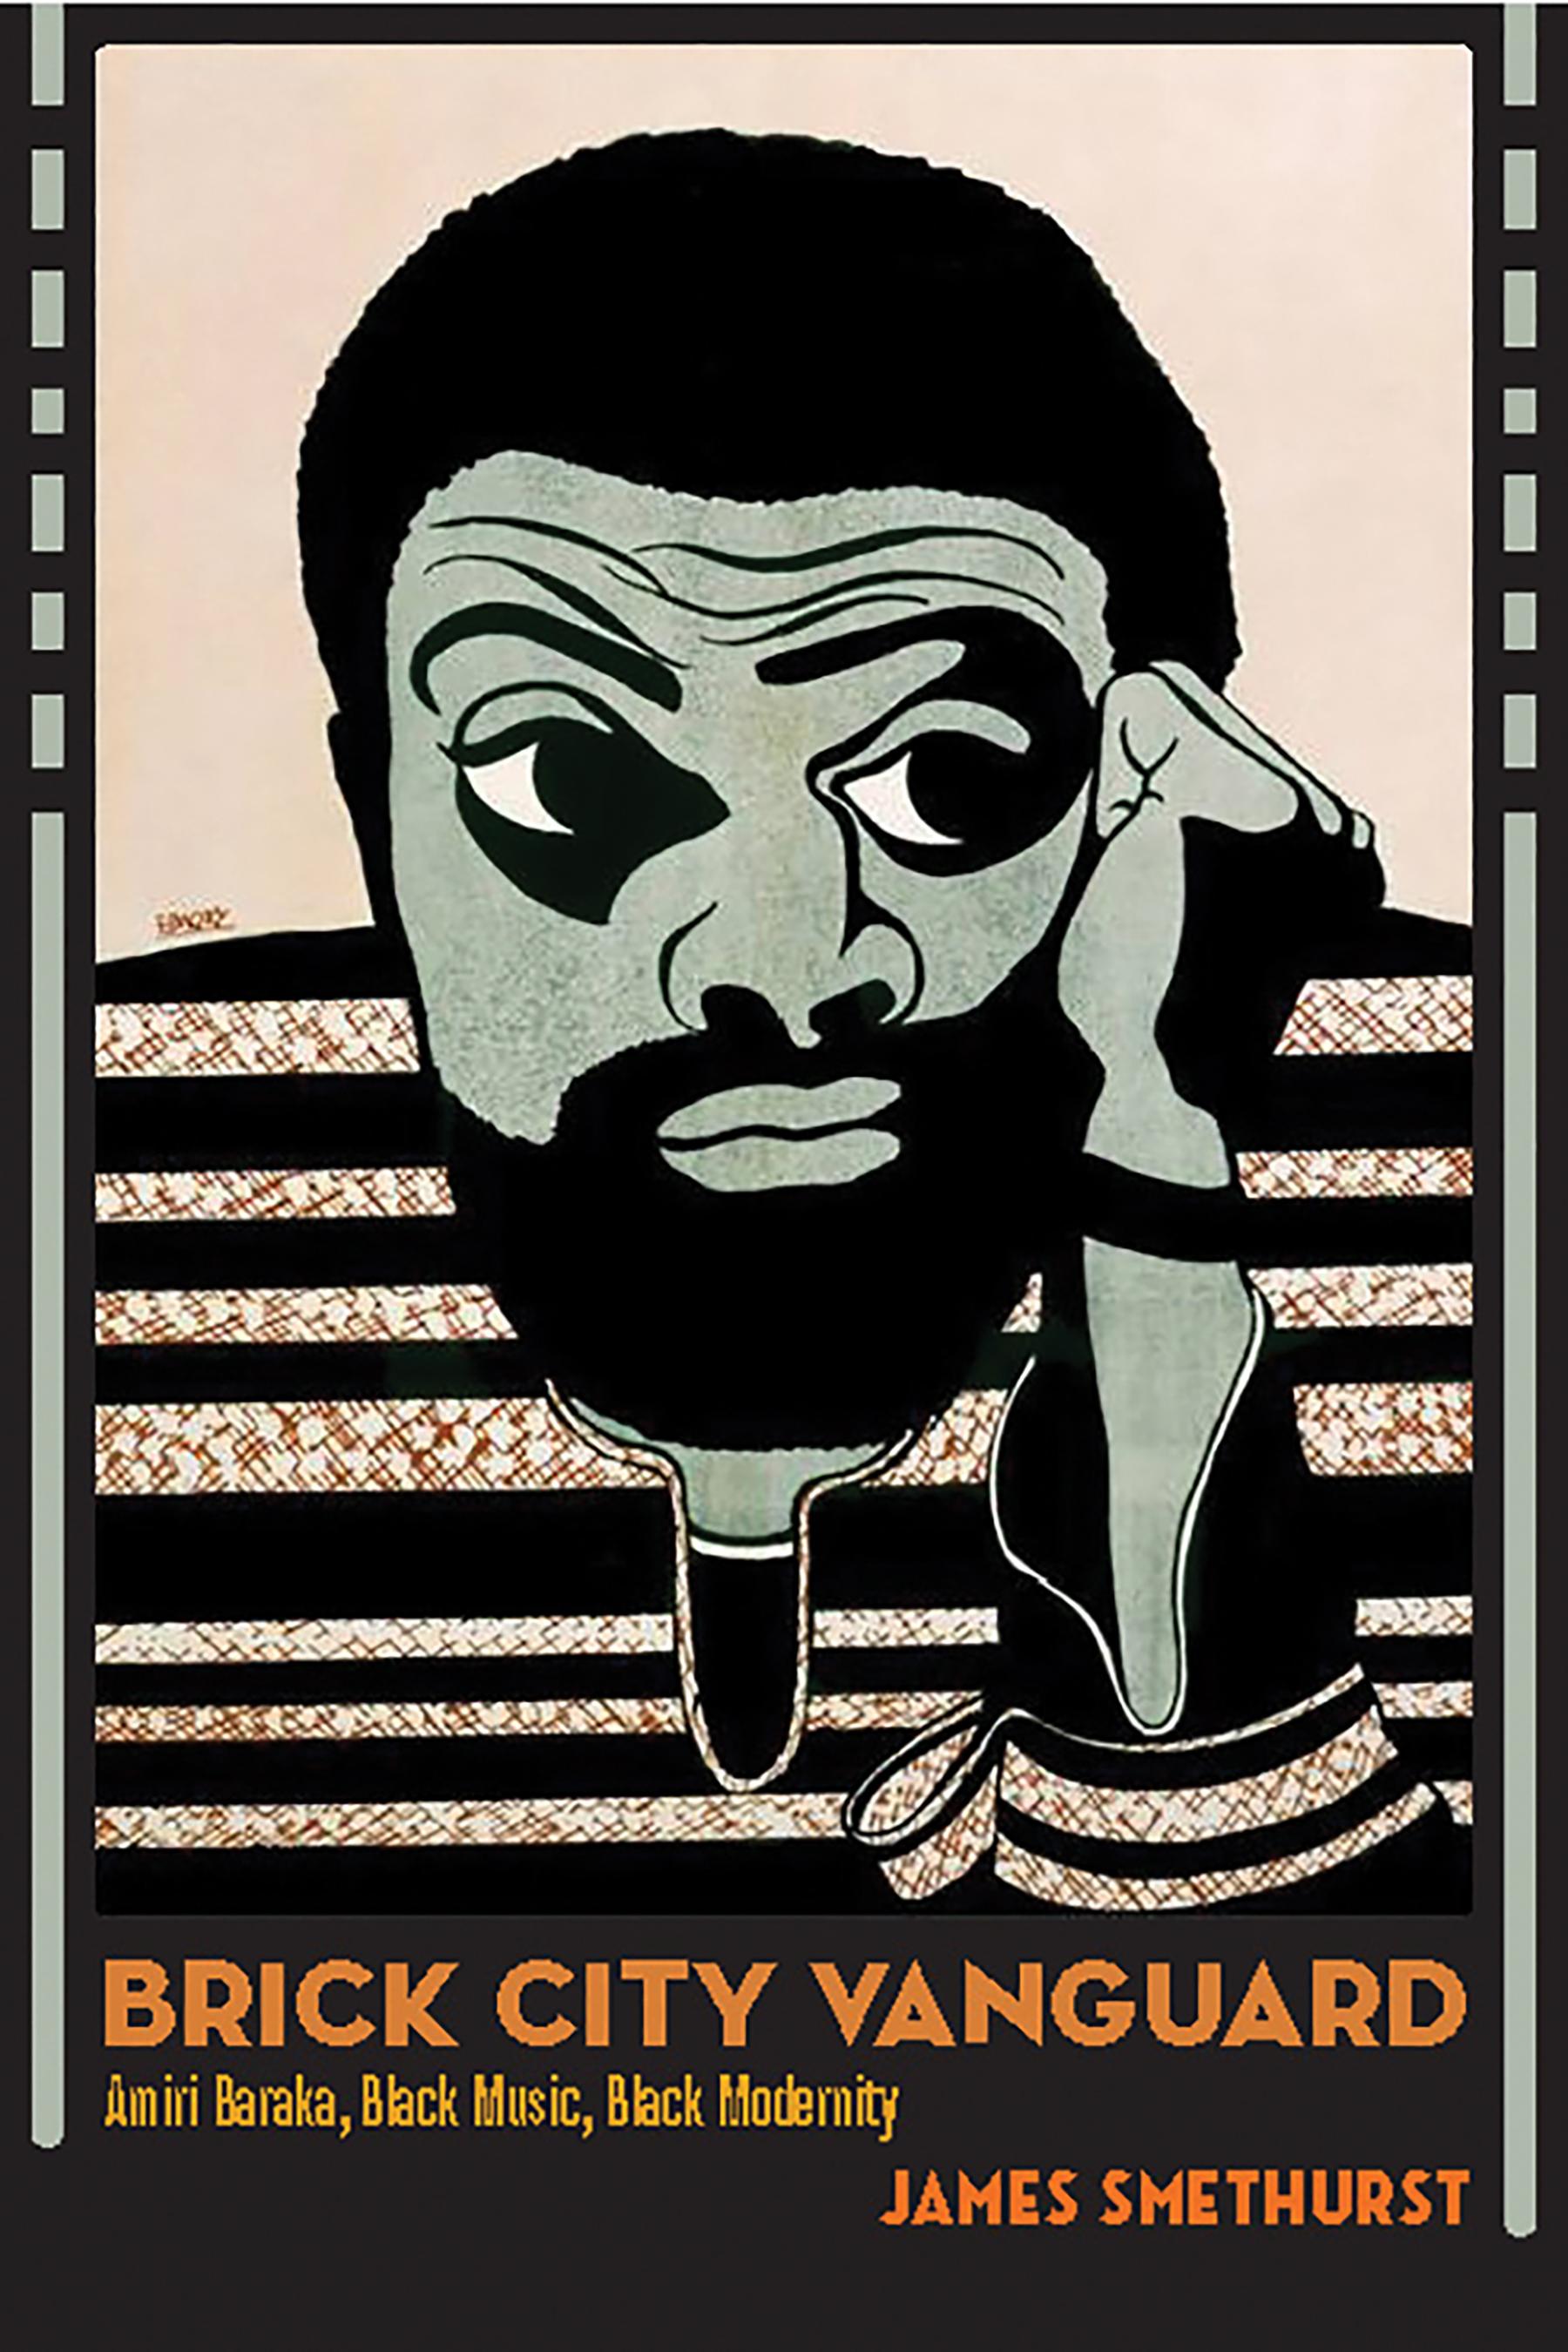 Brick City Vanguard: Amiri Baraka, Black Music, Black Modernity